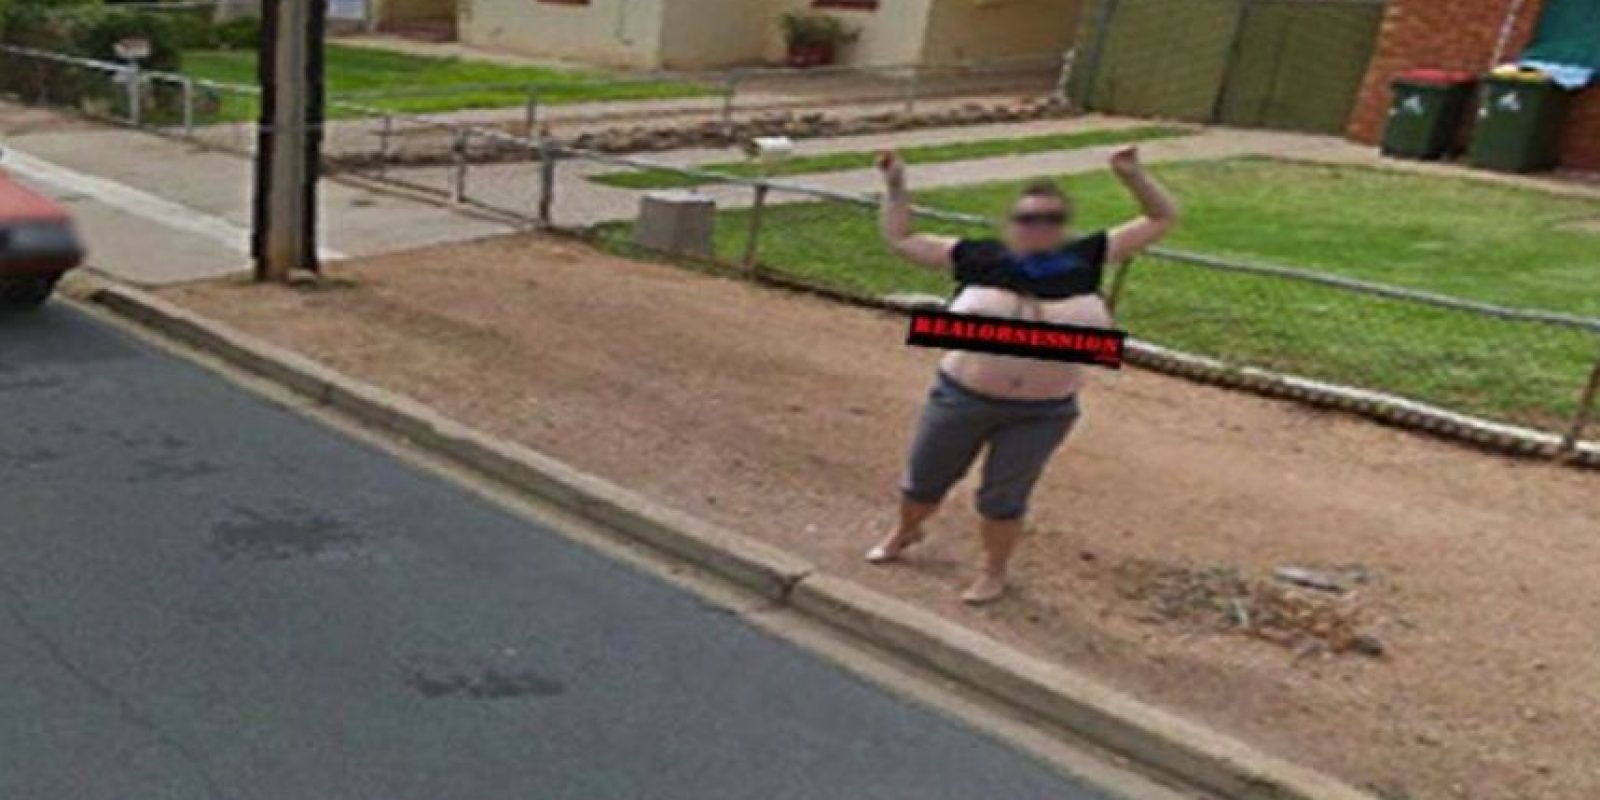 La foto de Karen Davis fue censurada por las autoridades. Foto:Google Maps